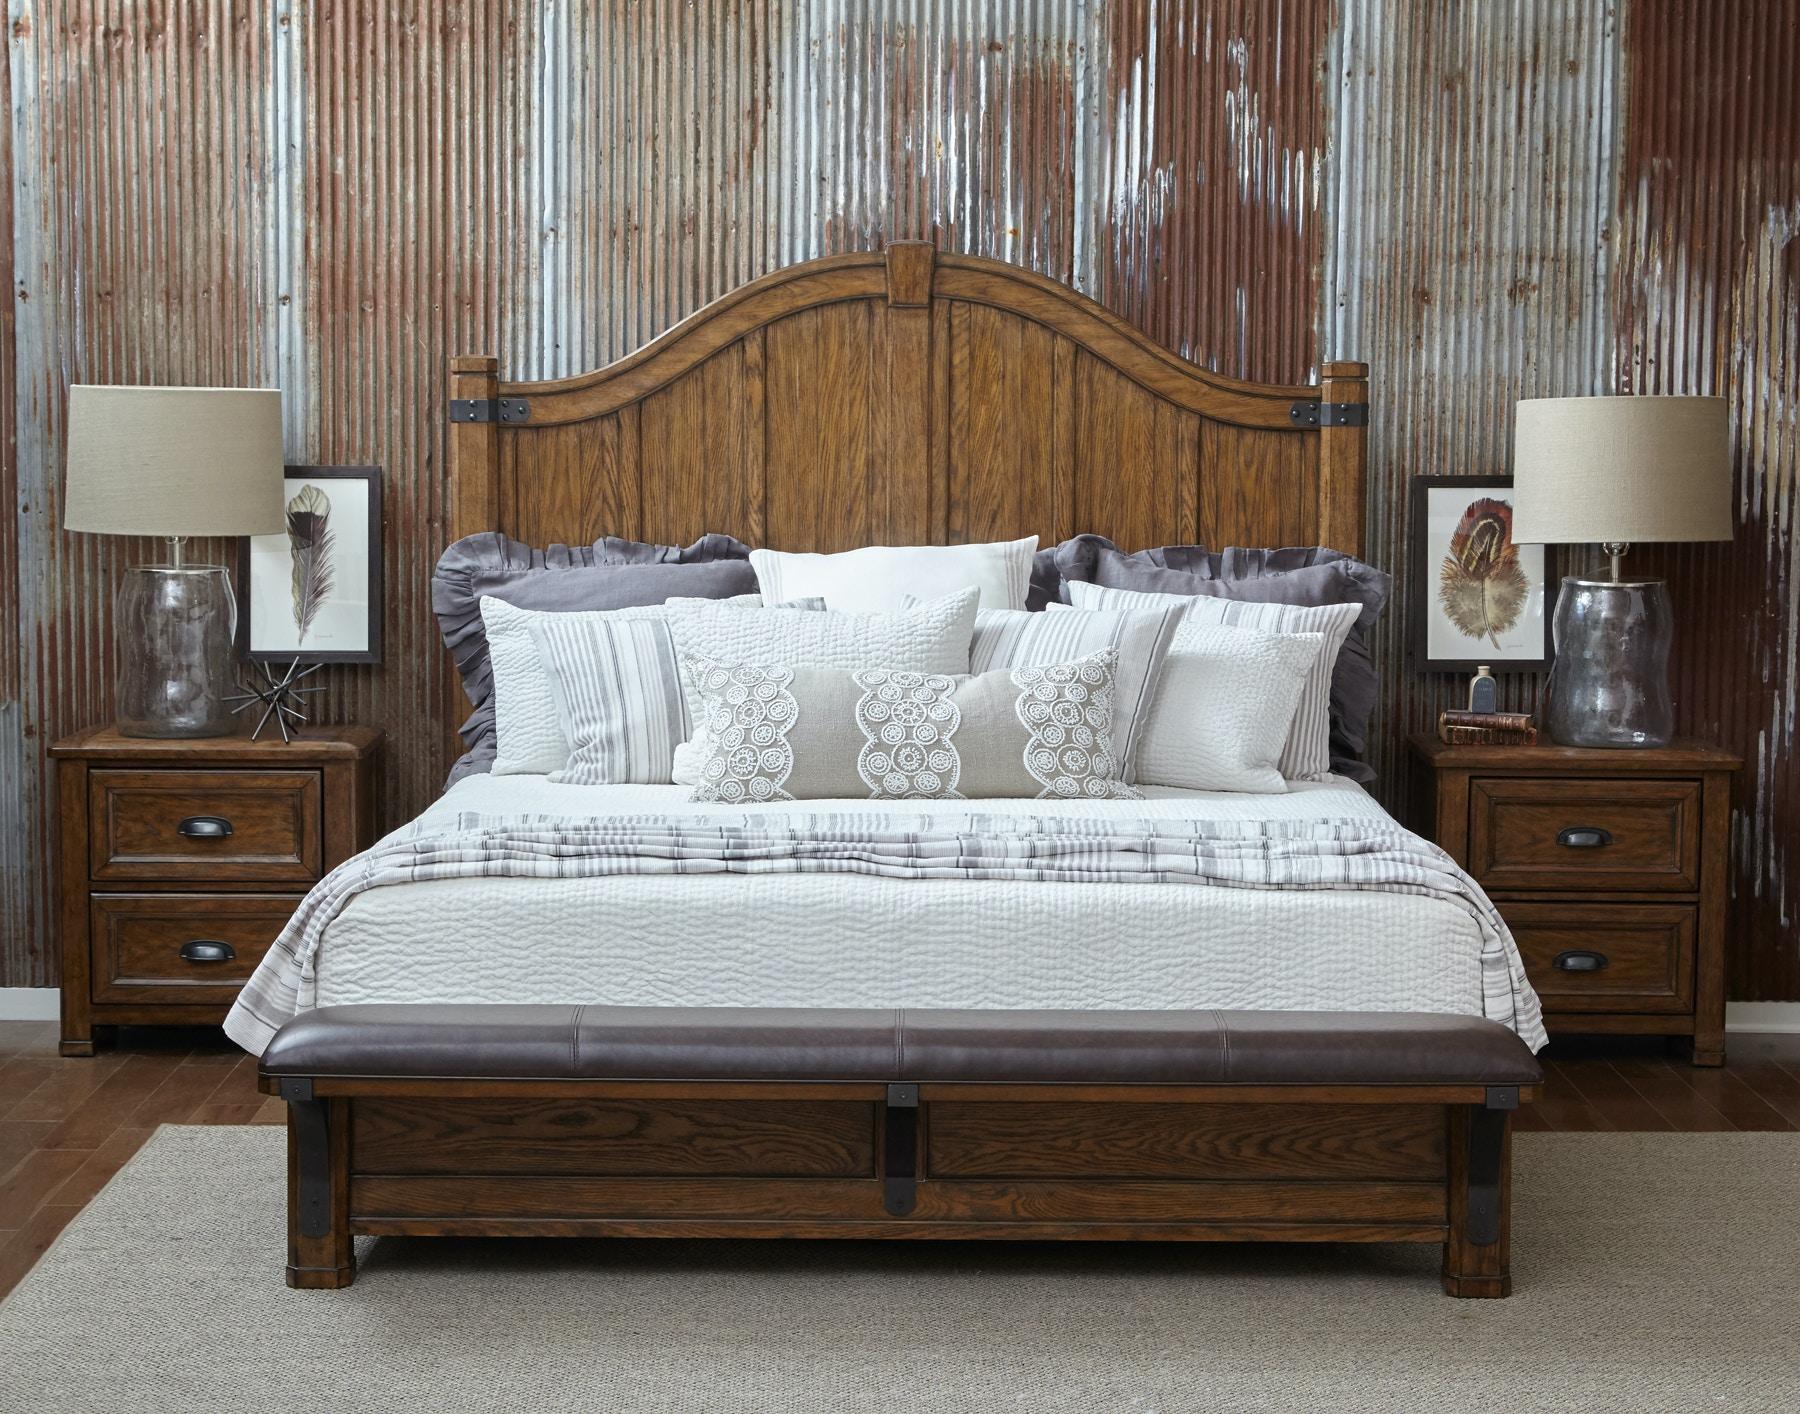 Pulaski Furniture Heartland Falls Bed   Queen 554594